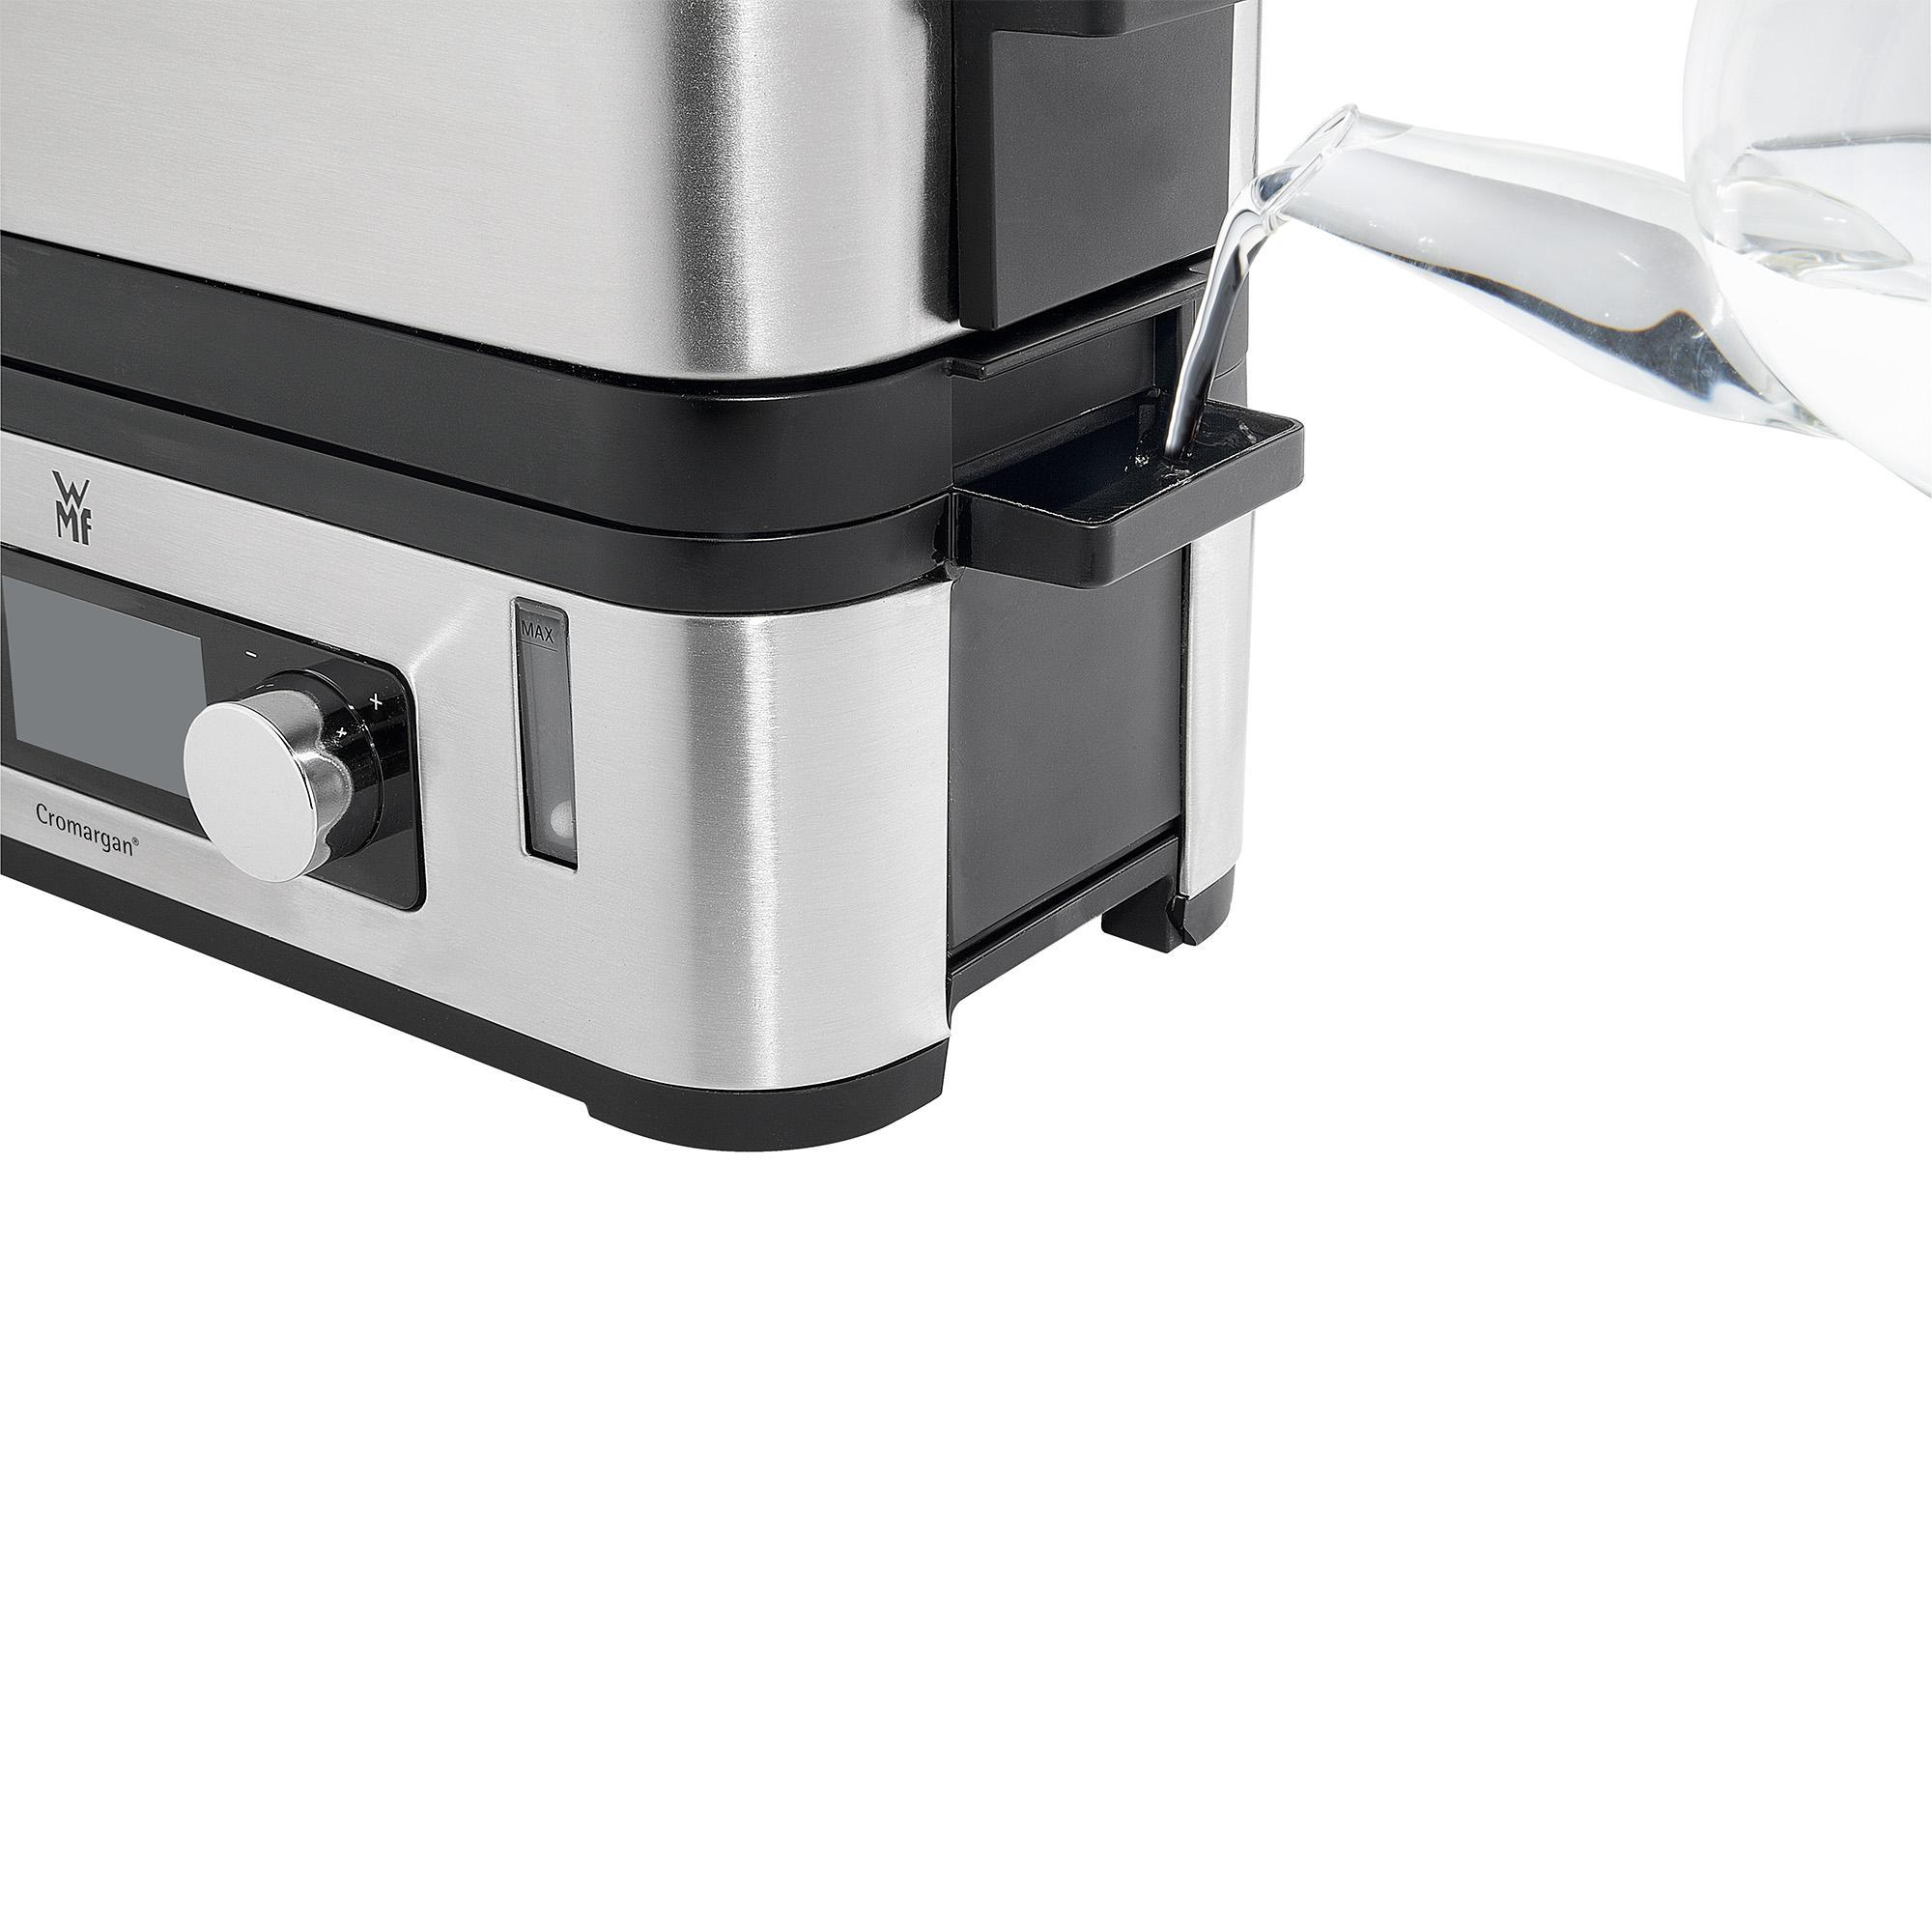 Amazon.de: WMF KÜCHENminis Dampfgarer, BPA-frei, 2